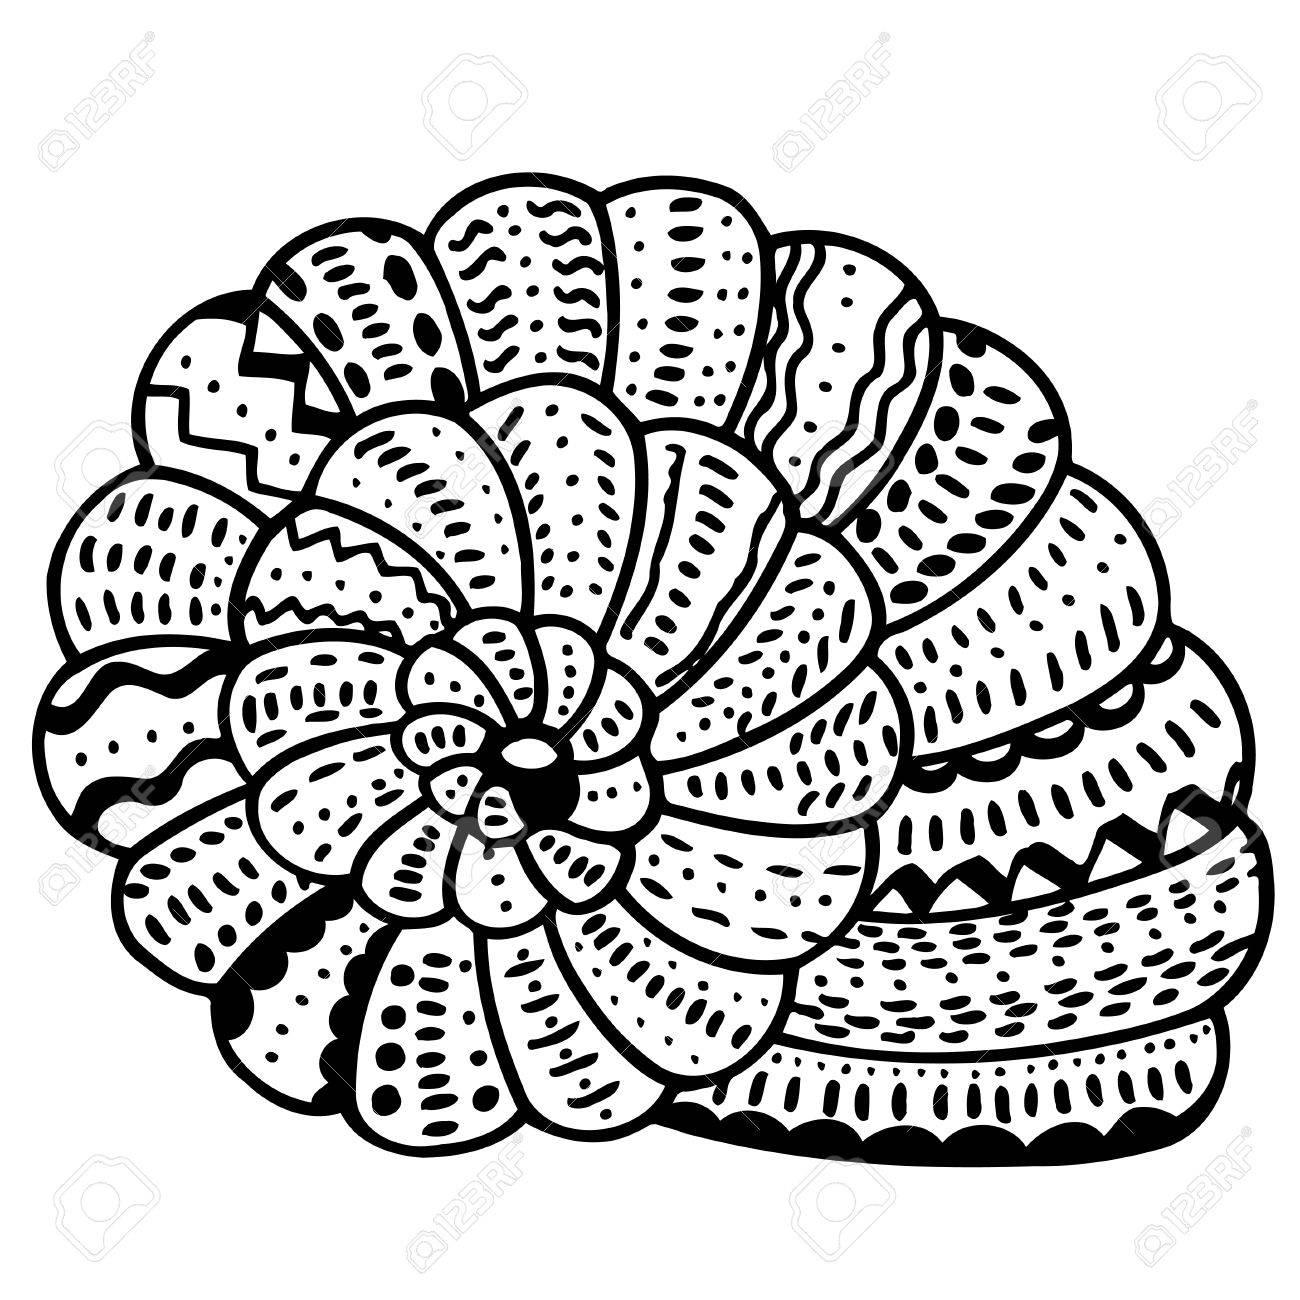 1300x1300 Stylized Shell. Hand Drawn Aquatic Doodle Vector Illustration